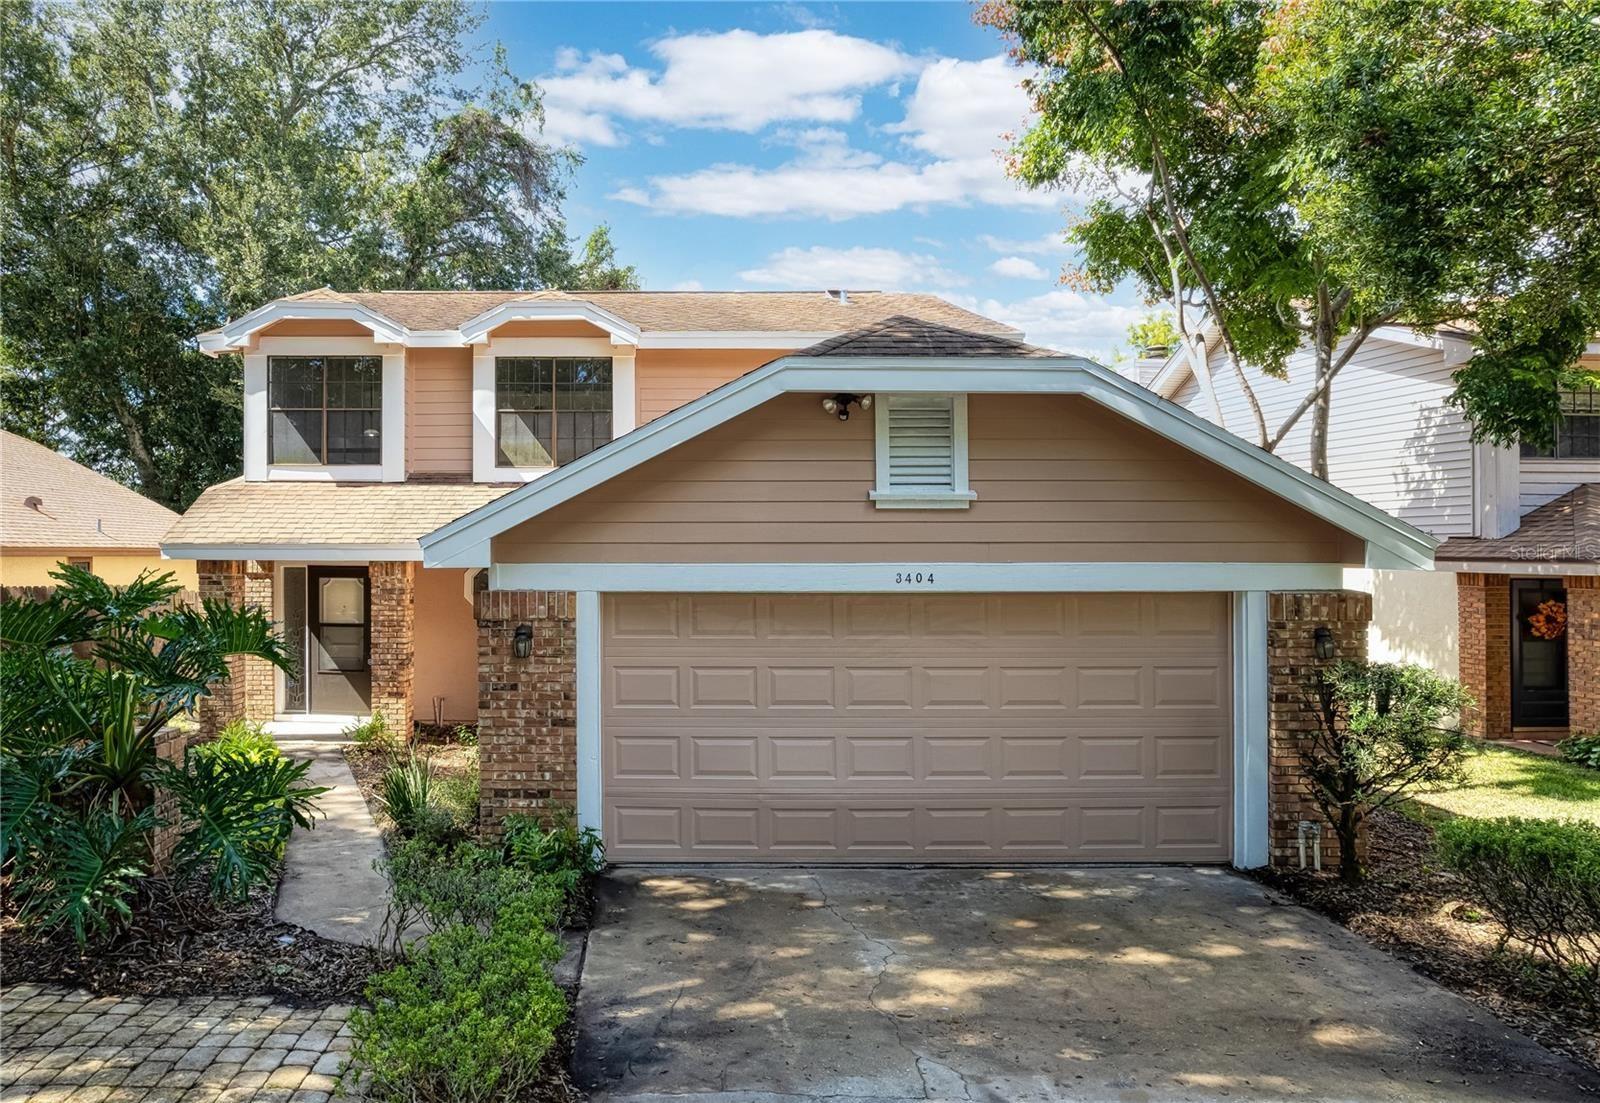 3404 CHATSWORTH LANE, Orlando, FL 32812 - #: O5980278